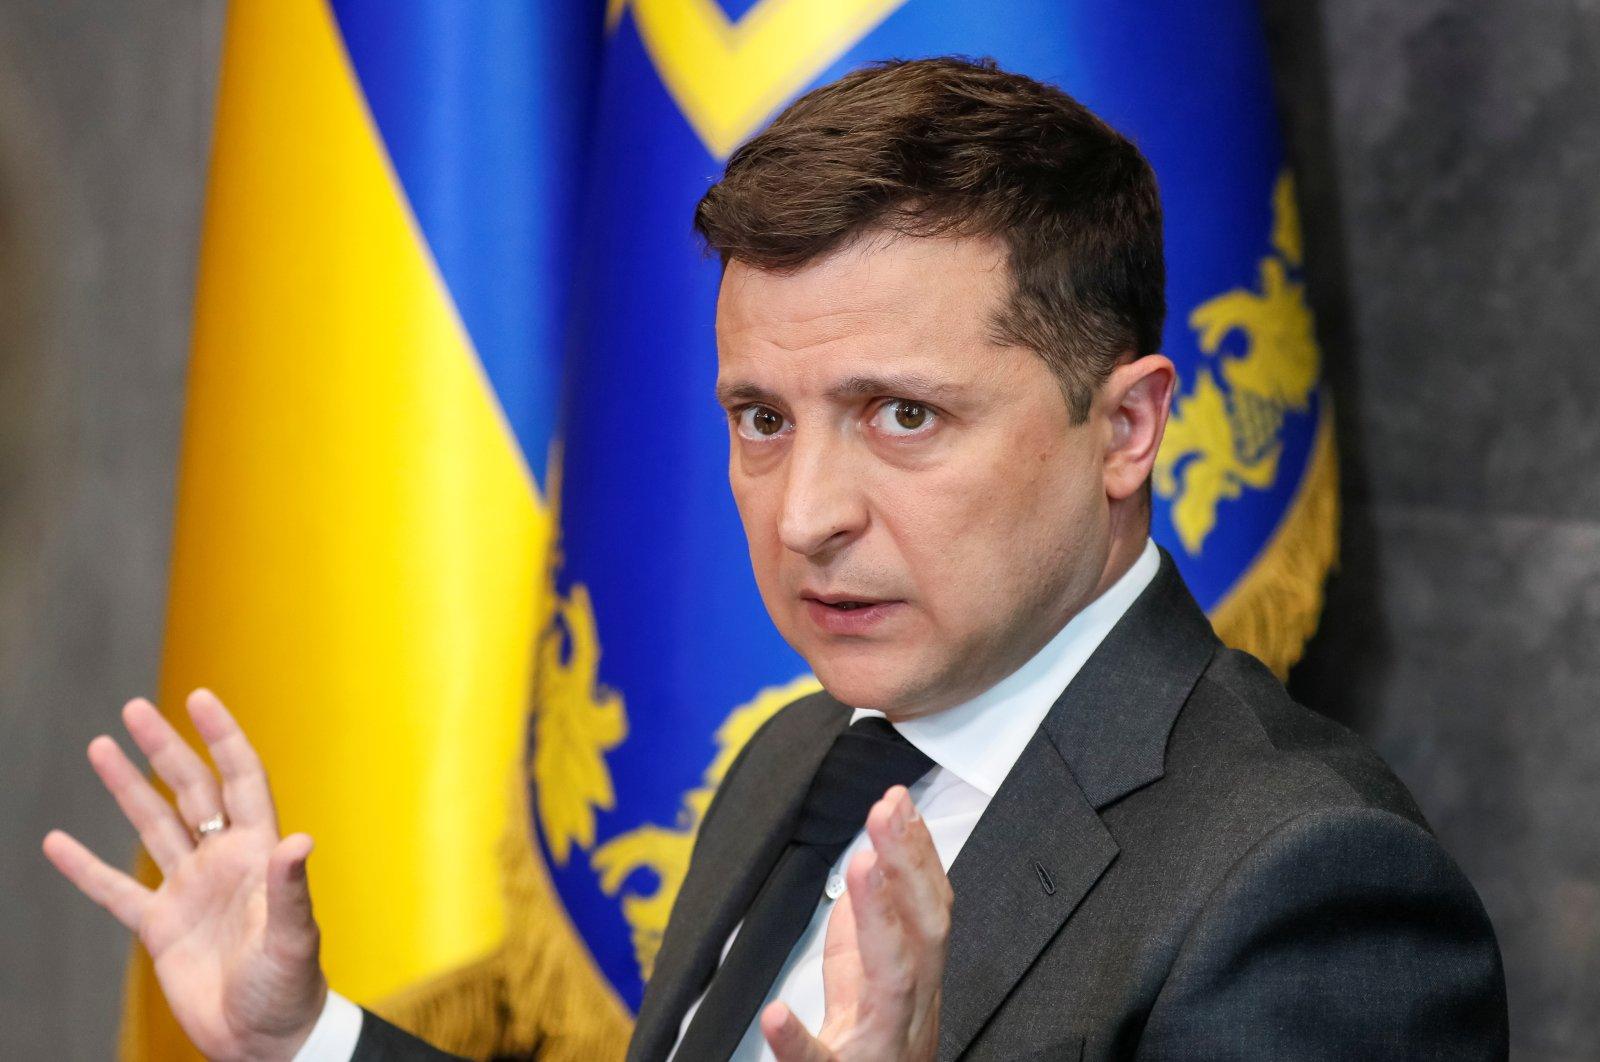 Ukrainian President Volodymyr Zelenskyy gestures during an interview in Kyiv, Ukraine June 14, 2021. (Reuters Photo)